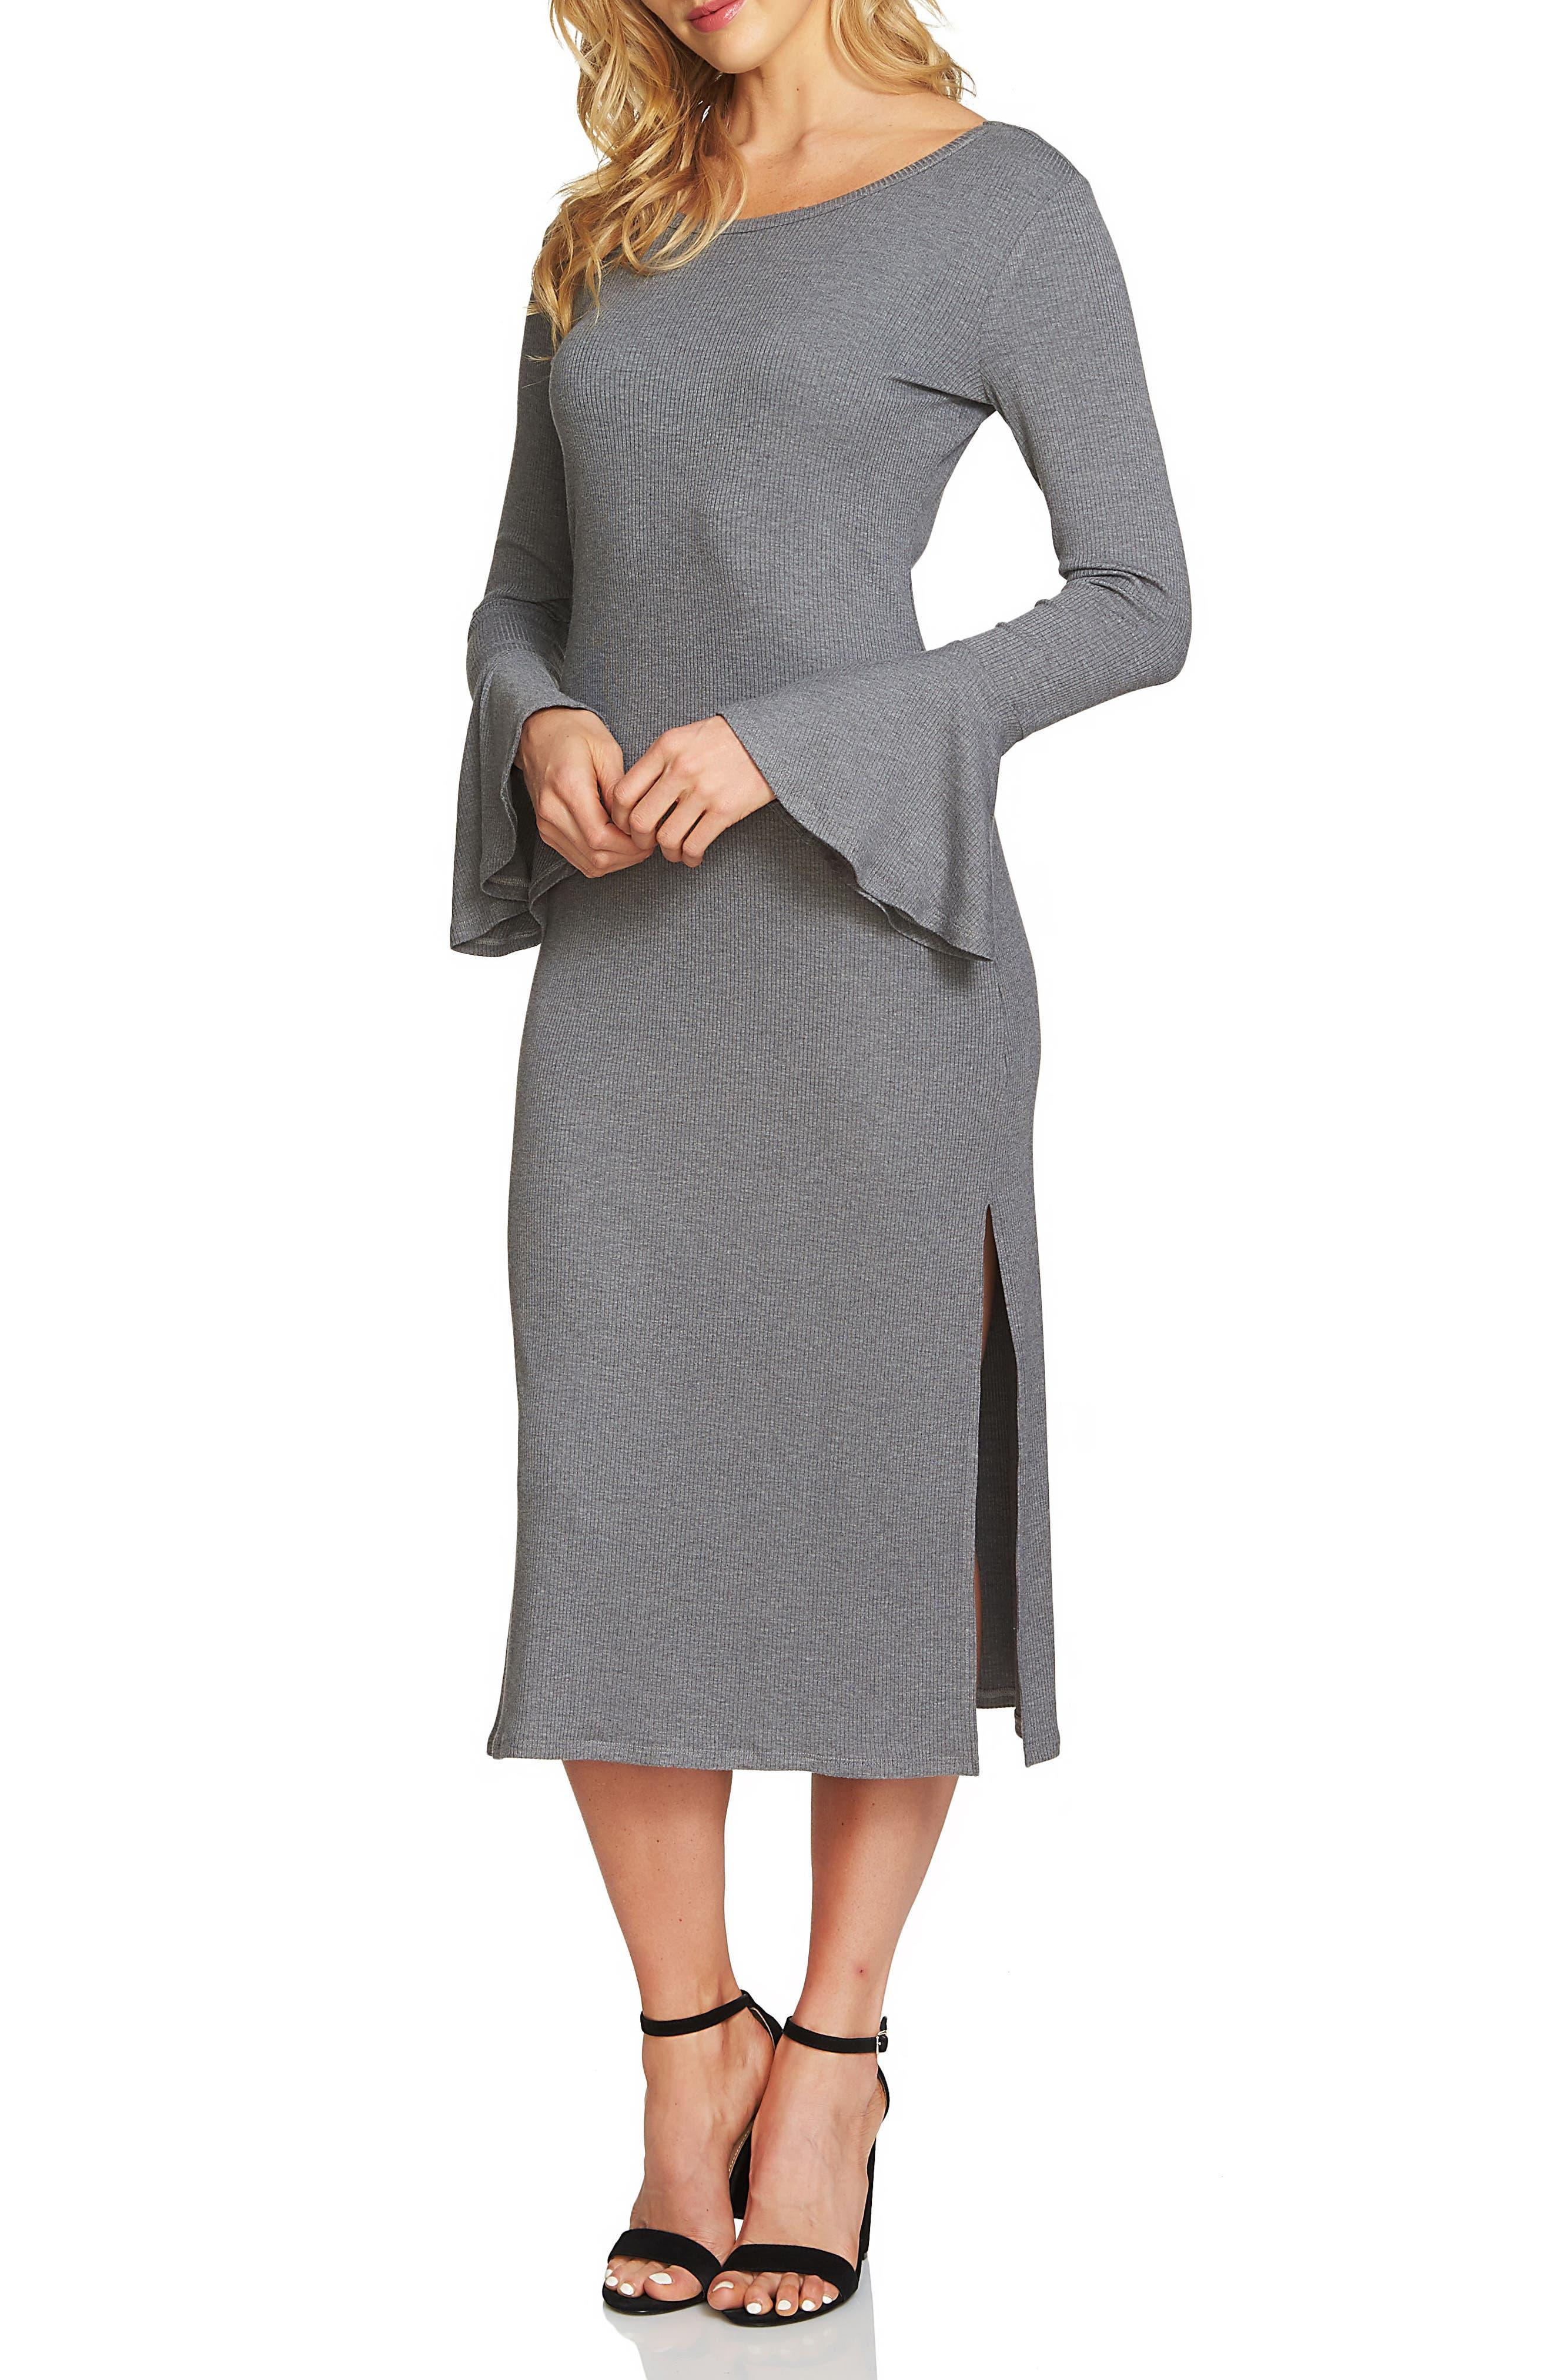 Main Image - 1.STATE Bell Sleeve Midi Dress